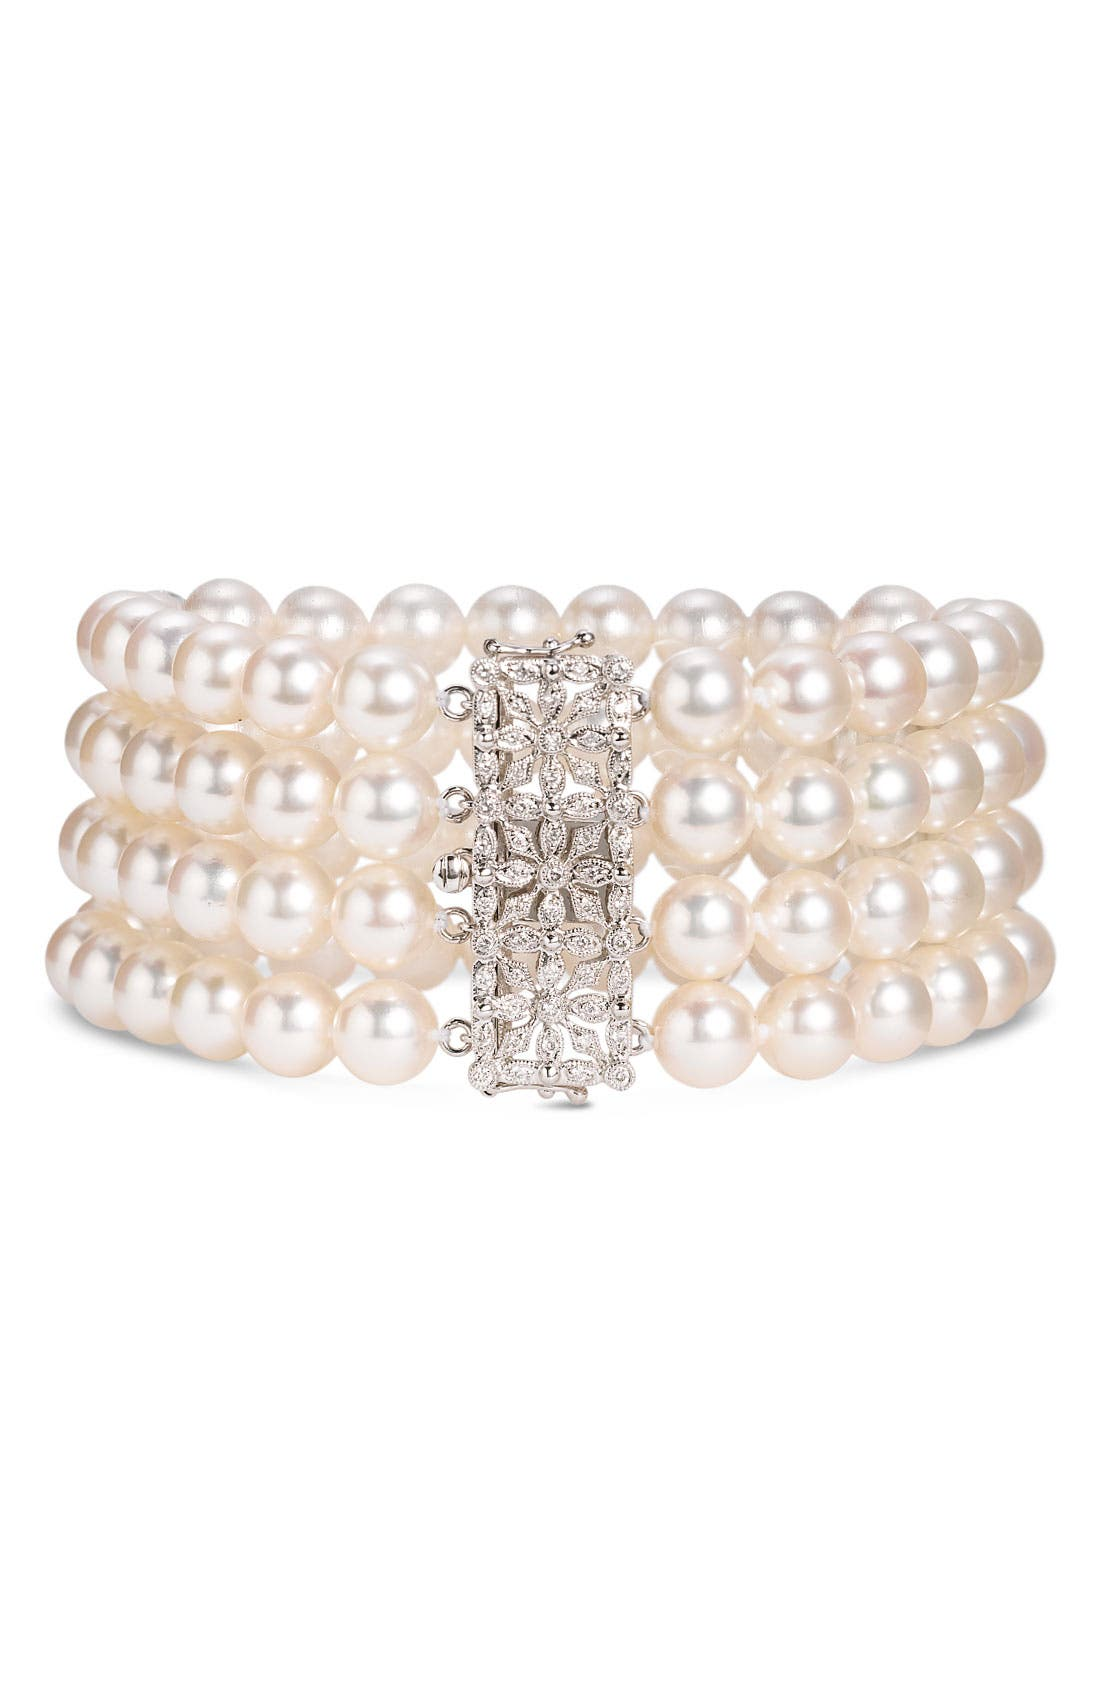 Main Image - Mastoloni 4-Strand Pearl & Diamond Clasp Bracelet